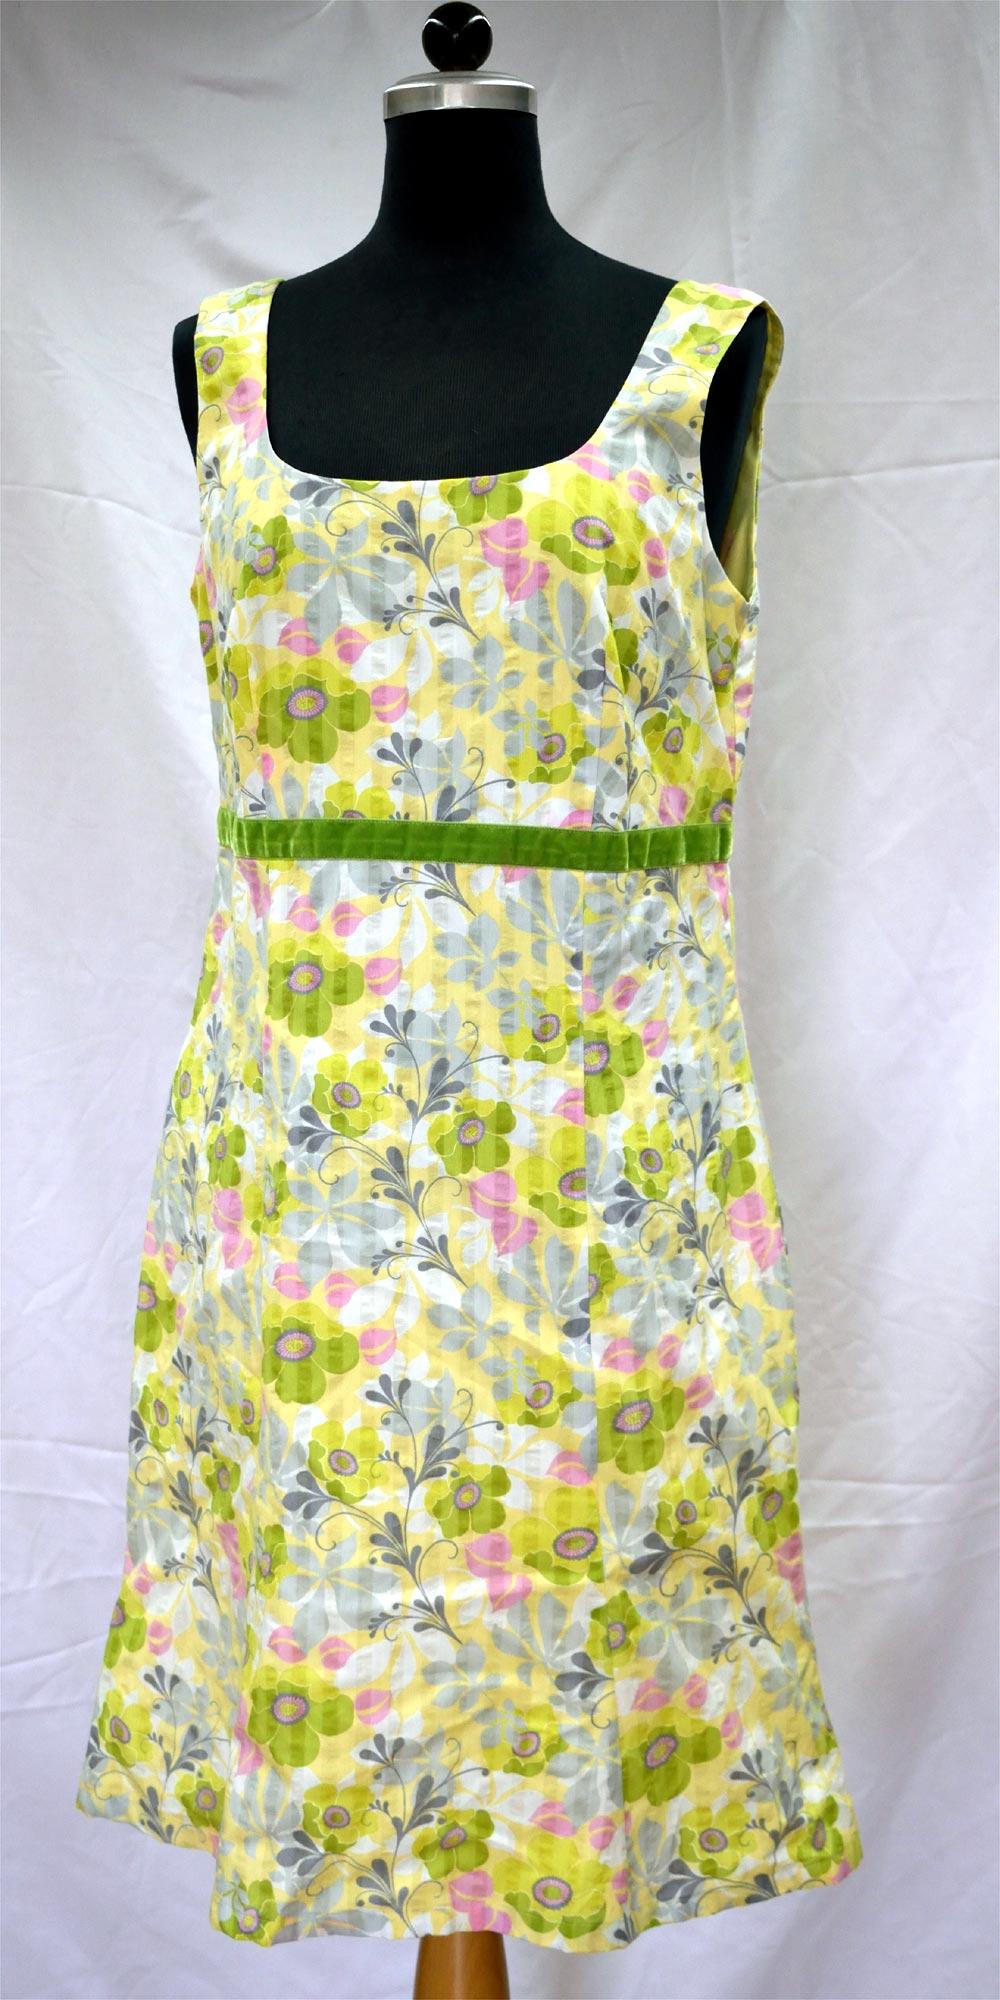 Sommerkleid - Maßatelier Schwarzer